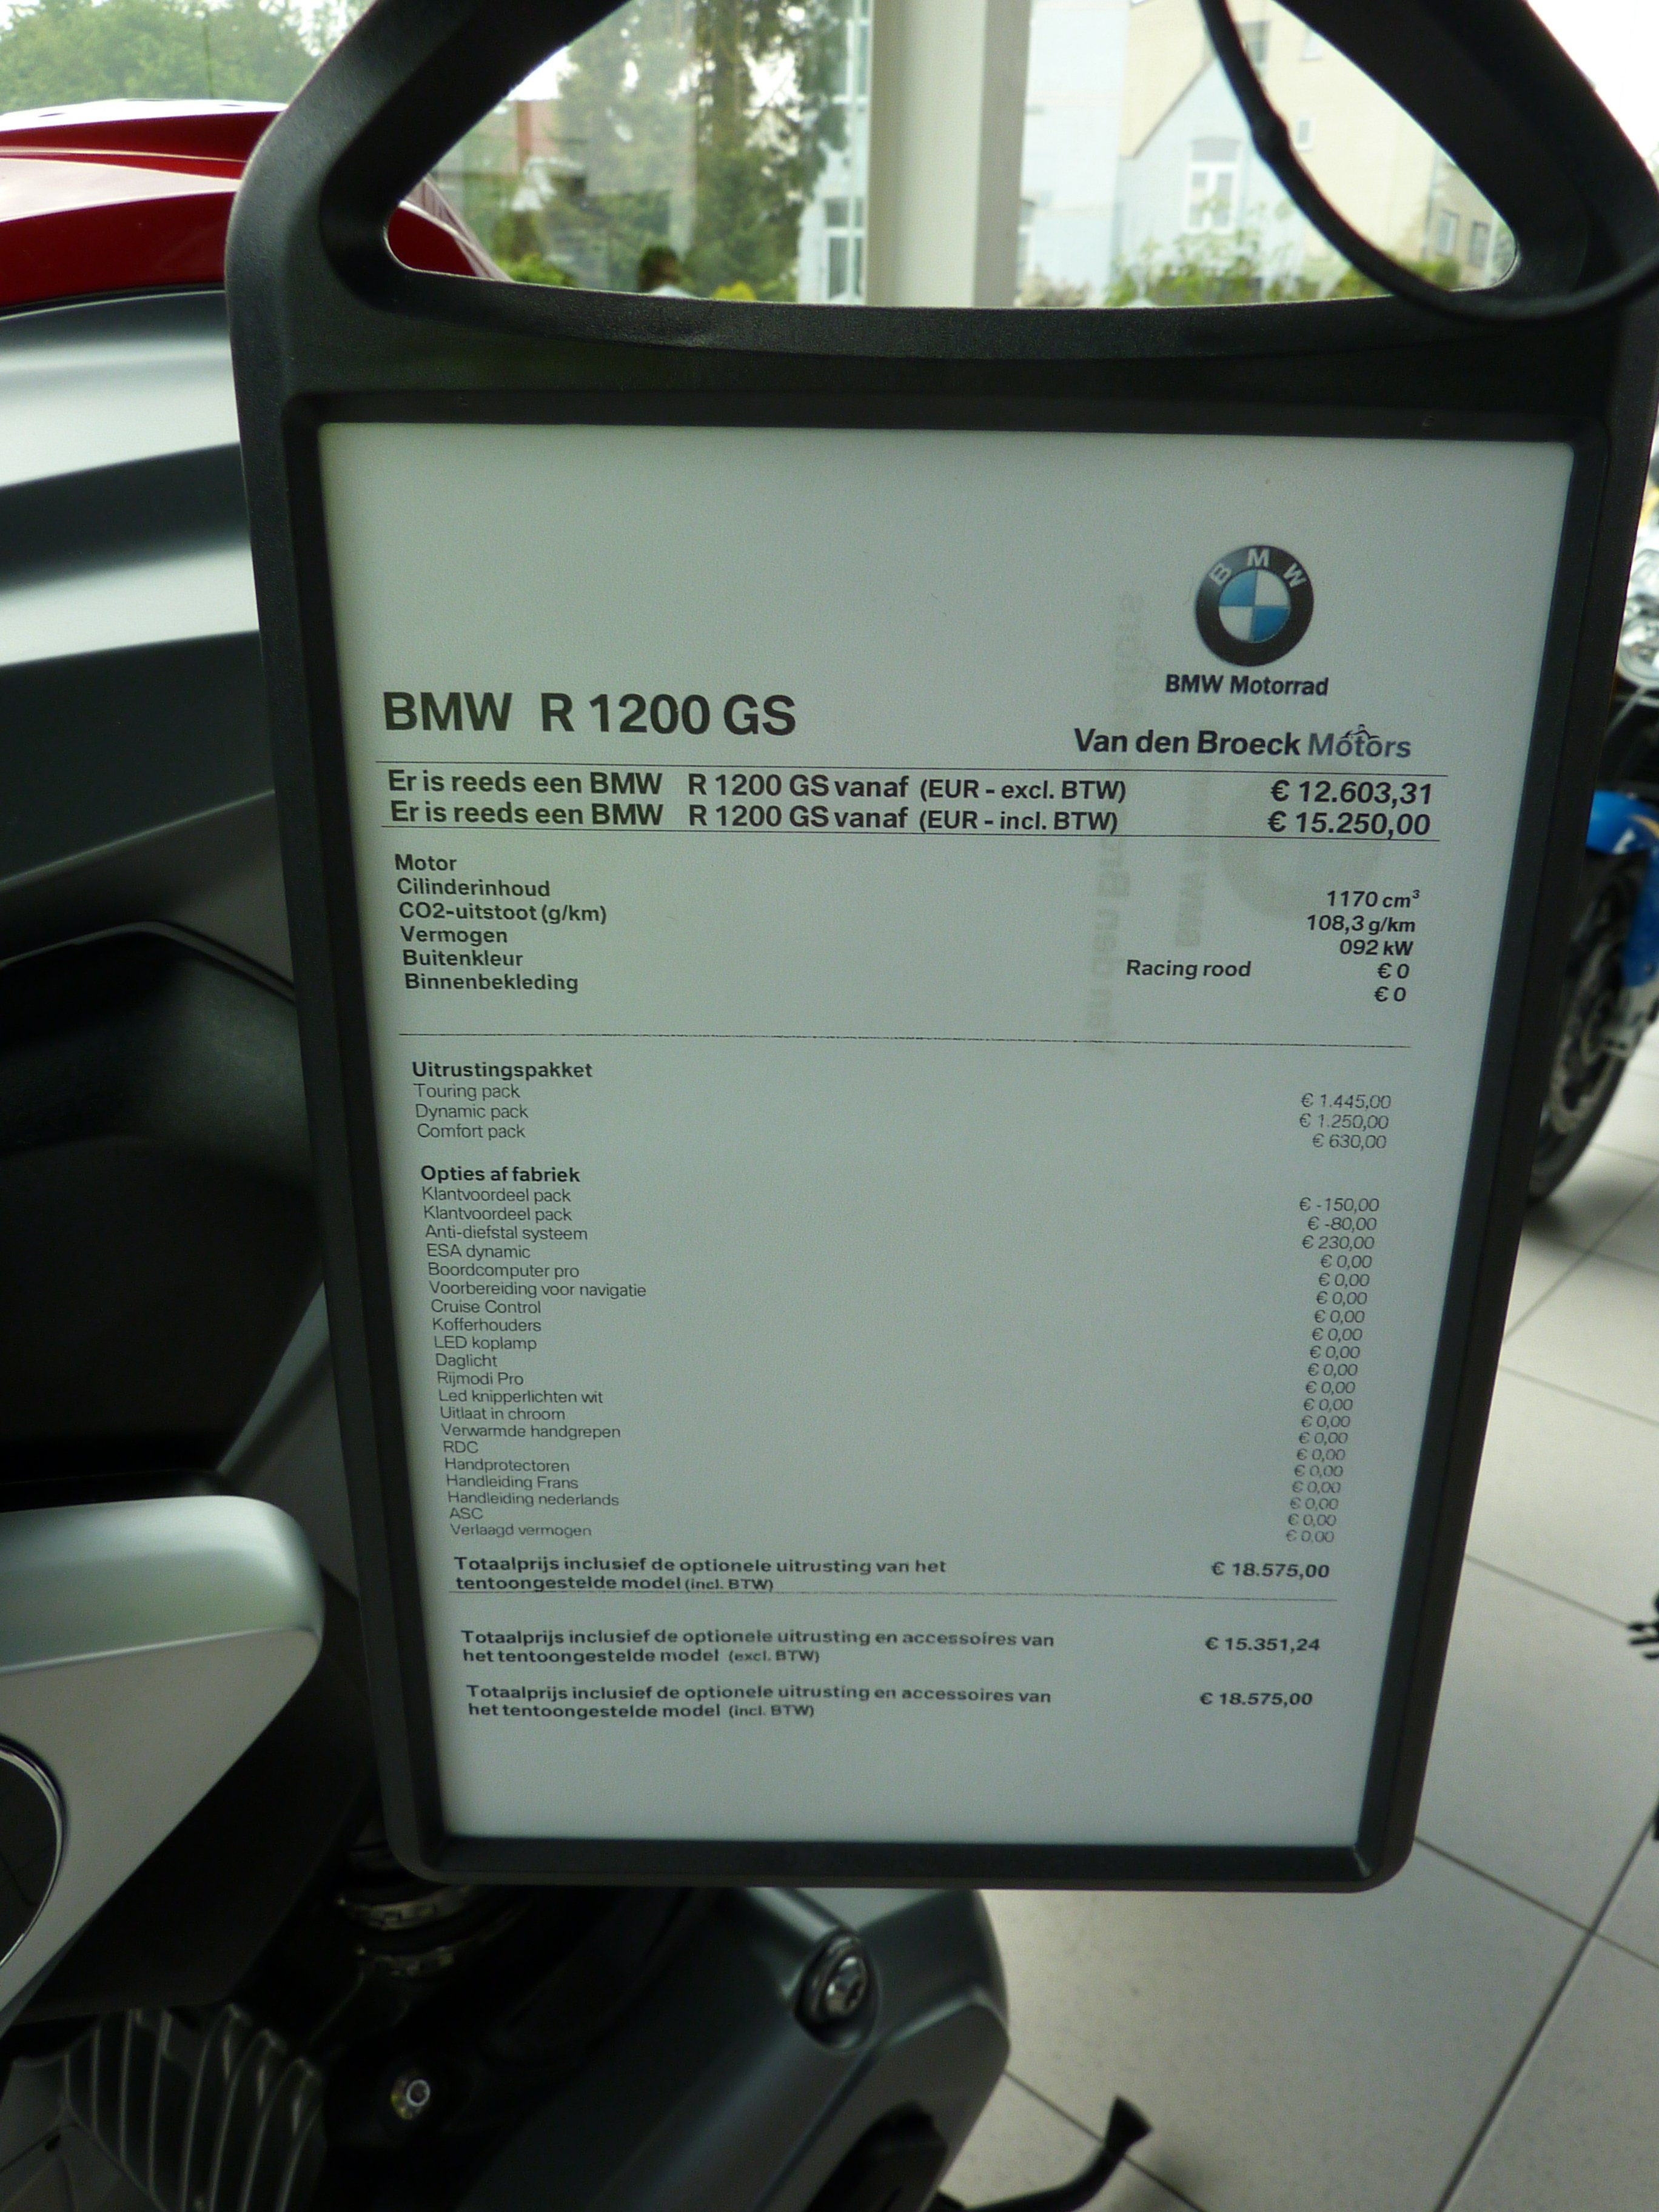 BMW GS 1200? Prijzige zaak, jammer!